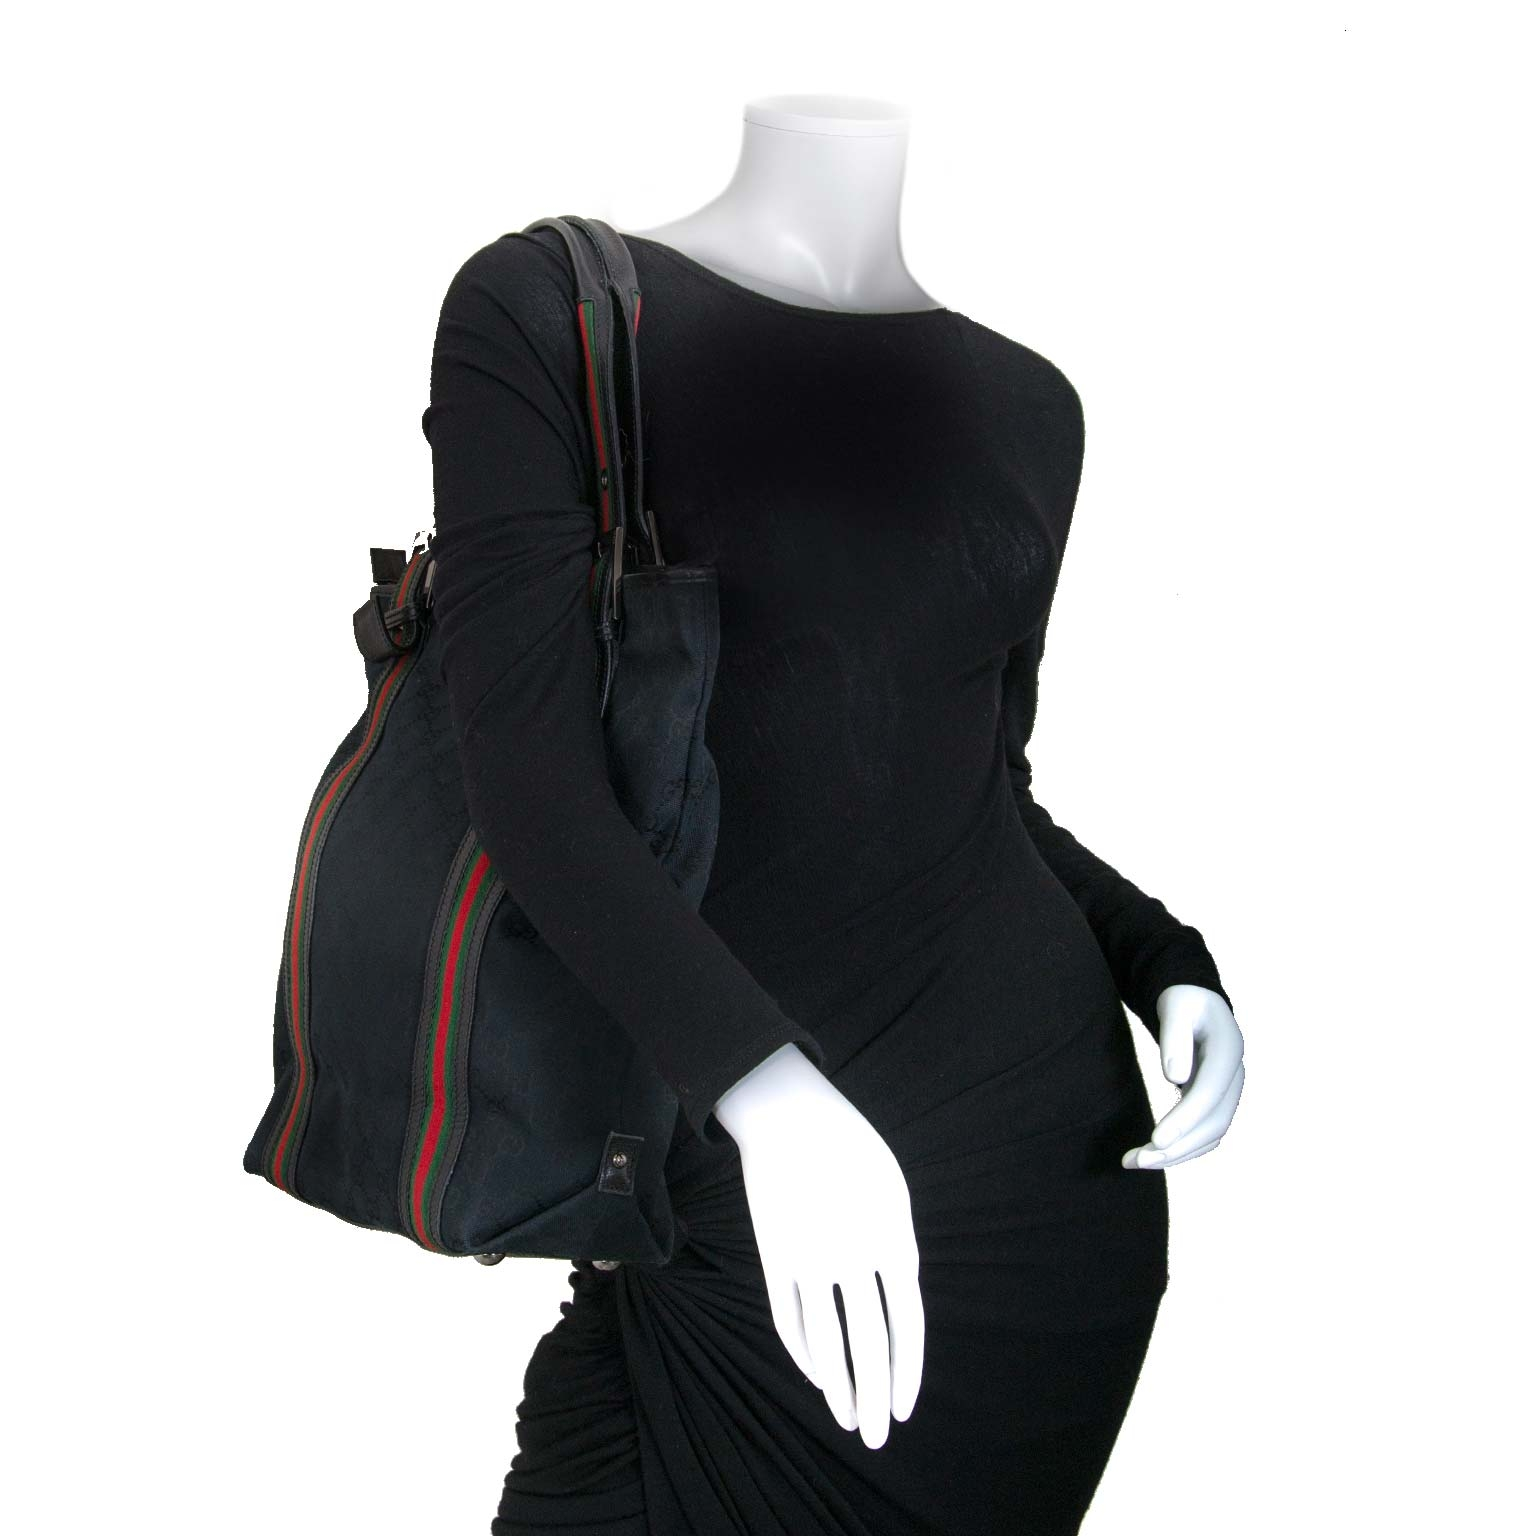 Gucci Black Monogram Fabric Webb Shopper Tote